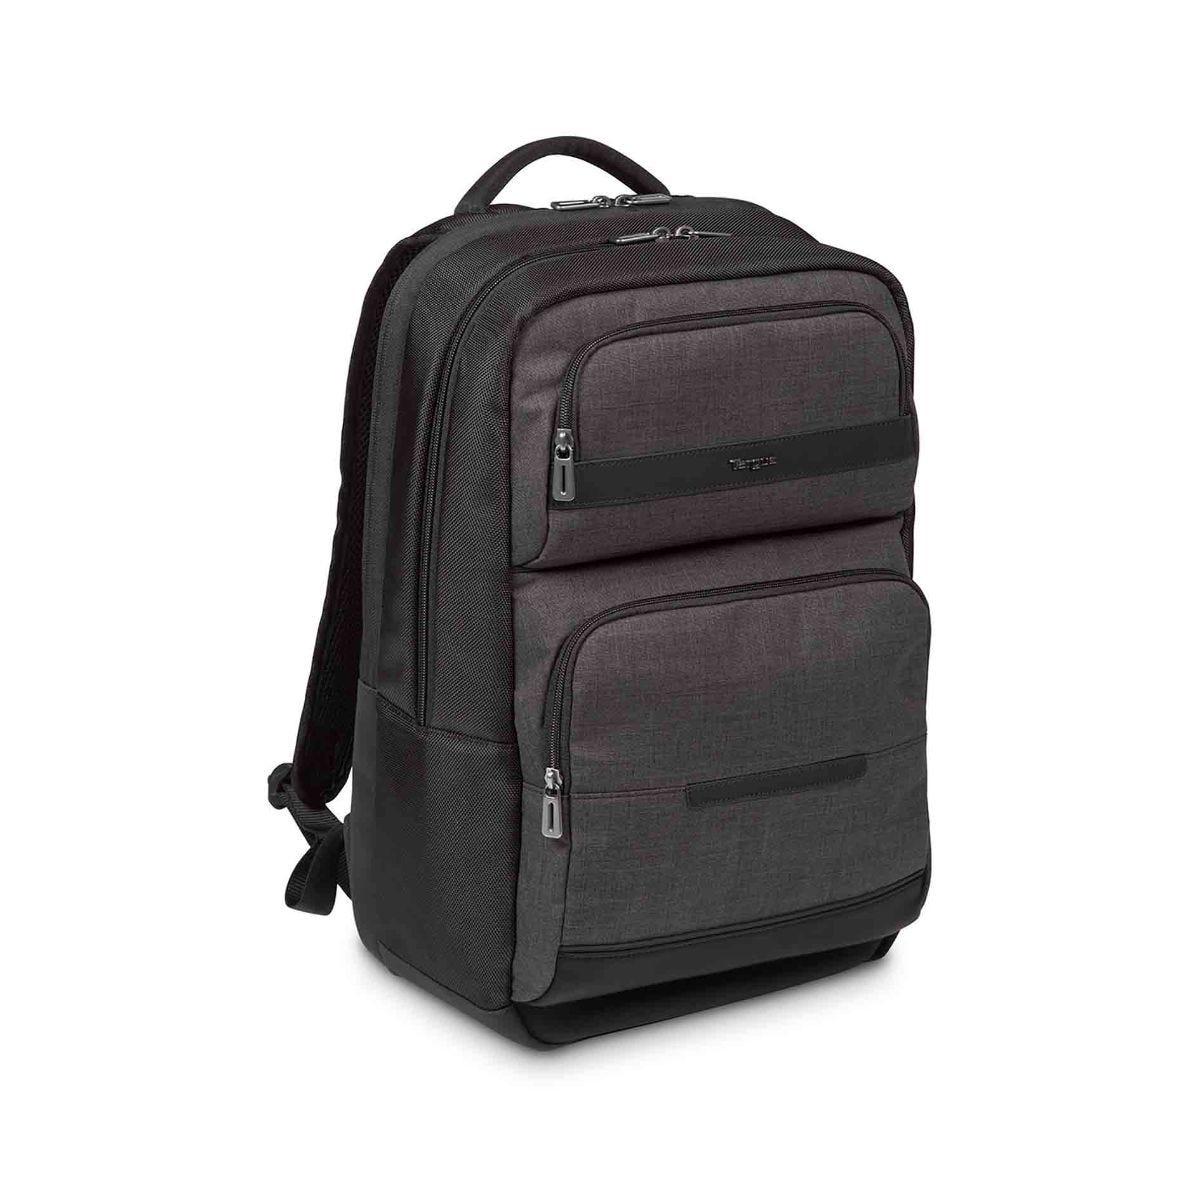 Image of Targus CitySmart Advanced Laptop Backpack 15.6 Inch, Black/Grey